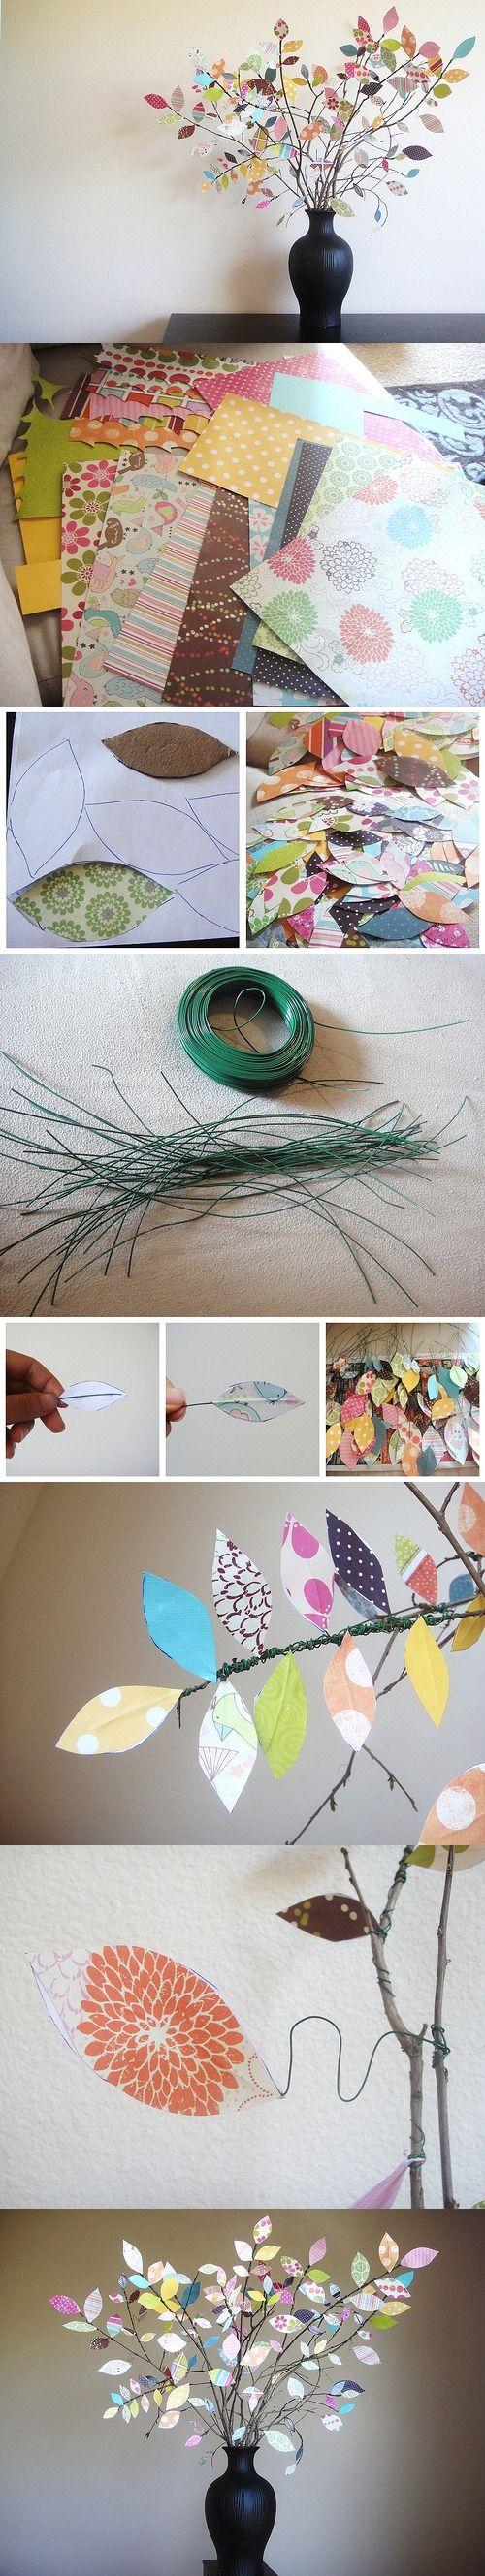 Árbol de scrapbooking o recortes de papel - Vía http://www.everydaymomideas.com/